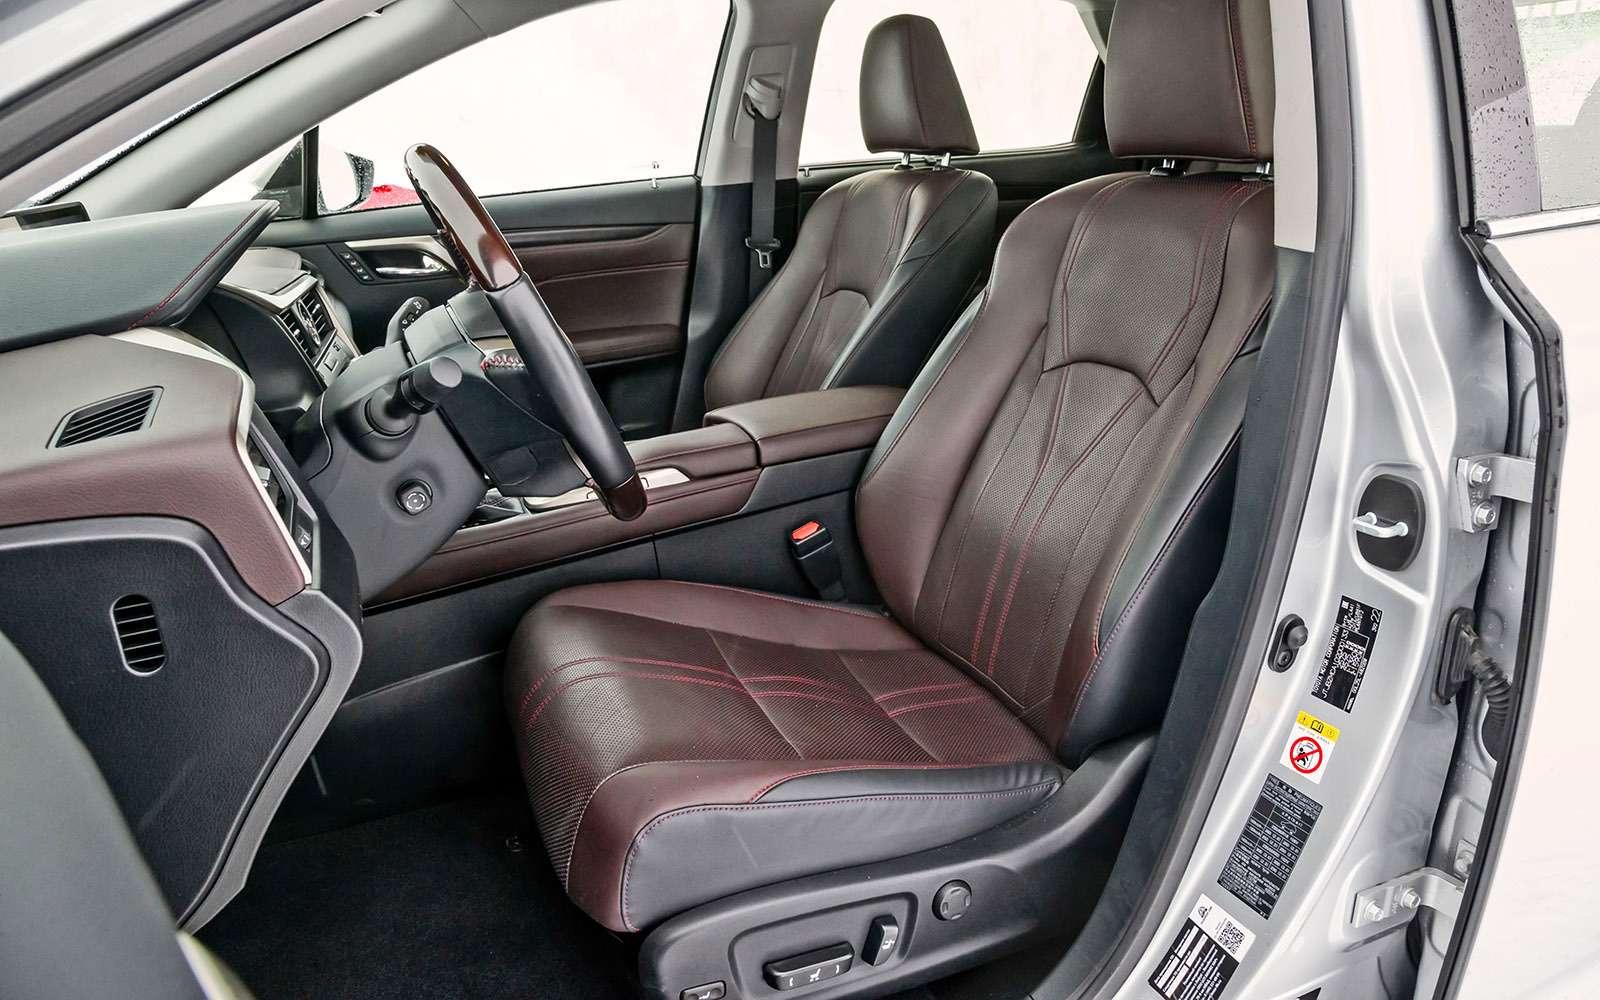 Тест премиум-кроссоверов: Lexus RX350, Cadillac XT5и Jaguar F-Pace— фото 721783